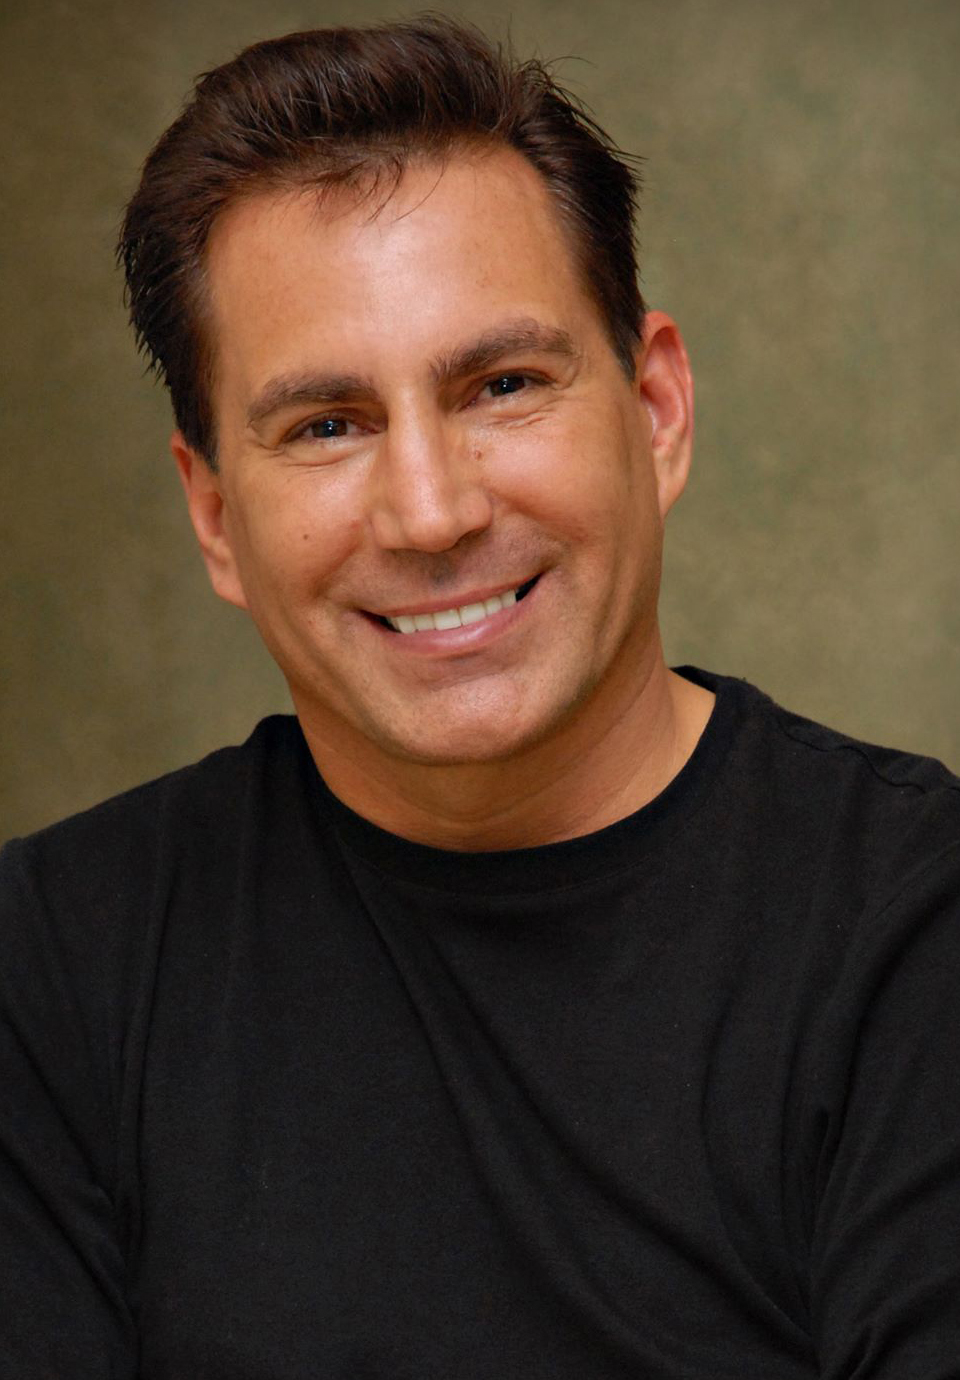 Dr. Michael Stampar DO Spago Day Spa Salon and Medispa Punta Gorda Florida